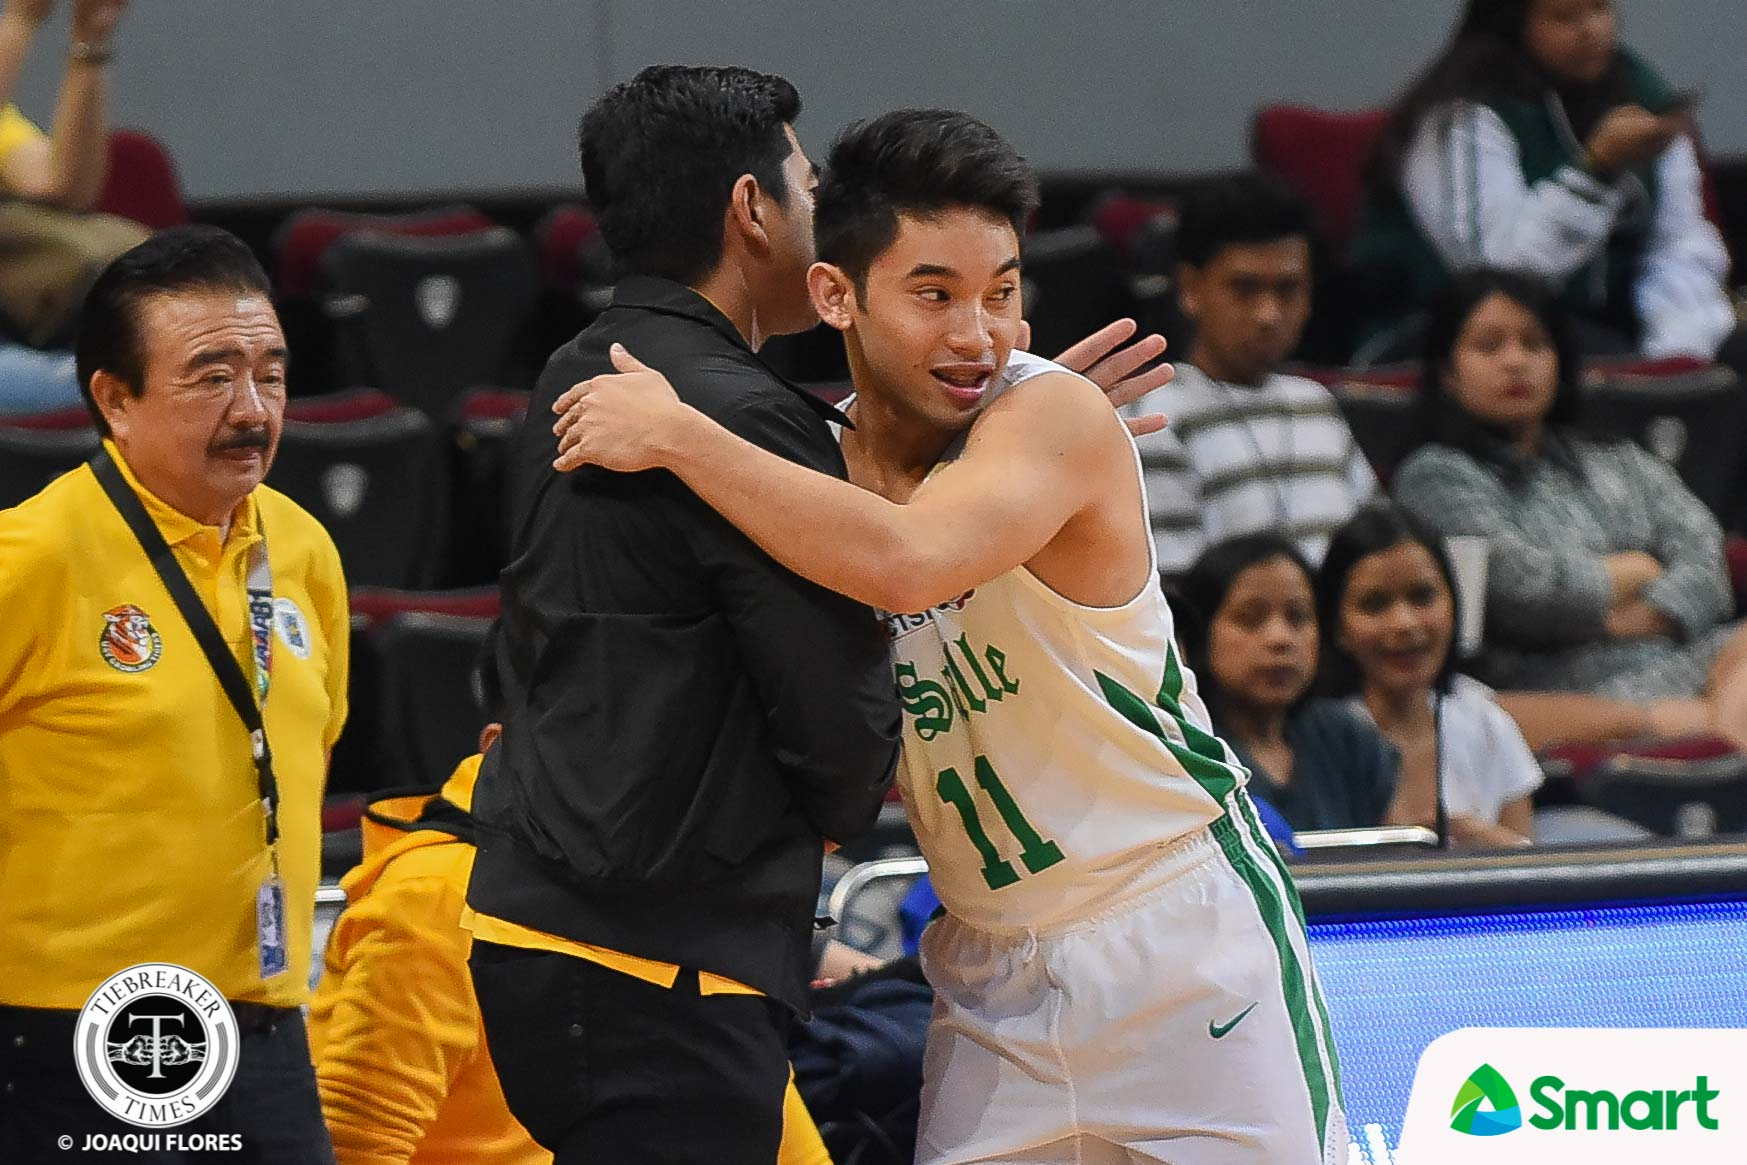 UAAP-81-DLSU-vs.-UST-Melecio-4498 Melecio says playing for four coaches in DLSU is an advantage Basketball DLSU News PBA UAAP  - philippine sports news